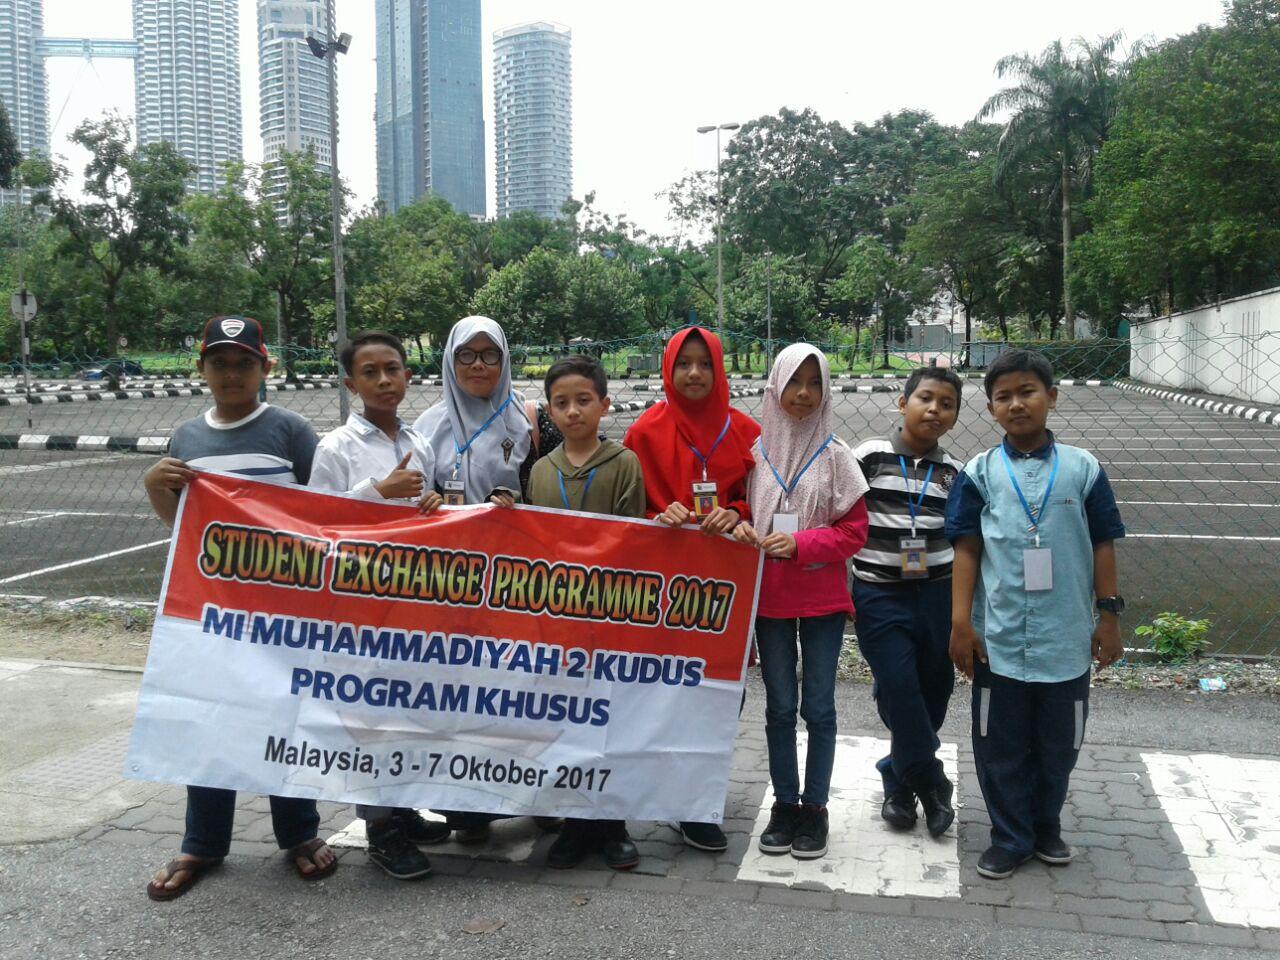 Mimudaku Ikuti Student Exchange di Malaysia